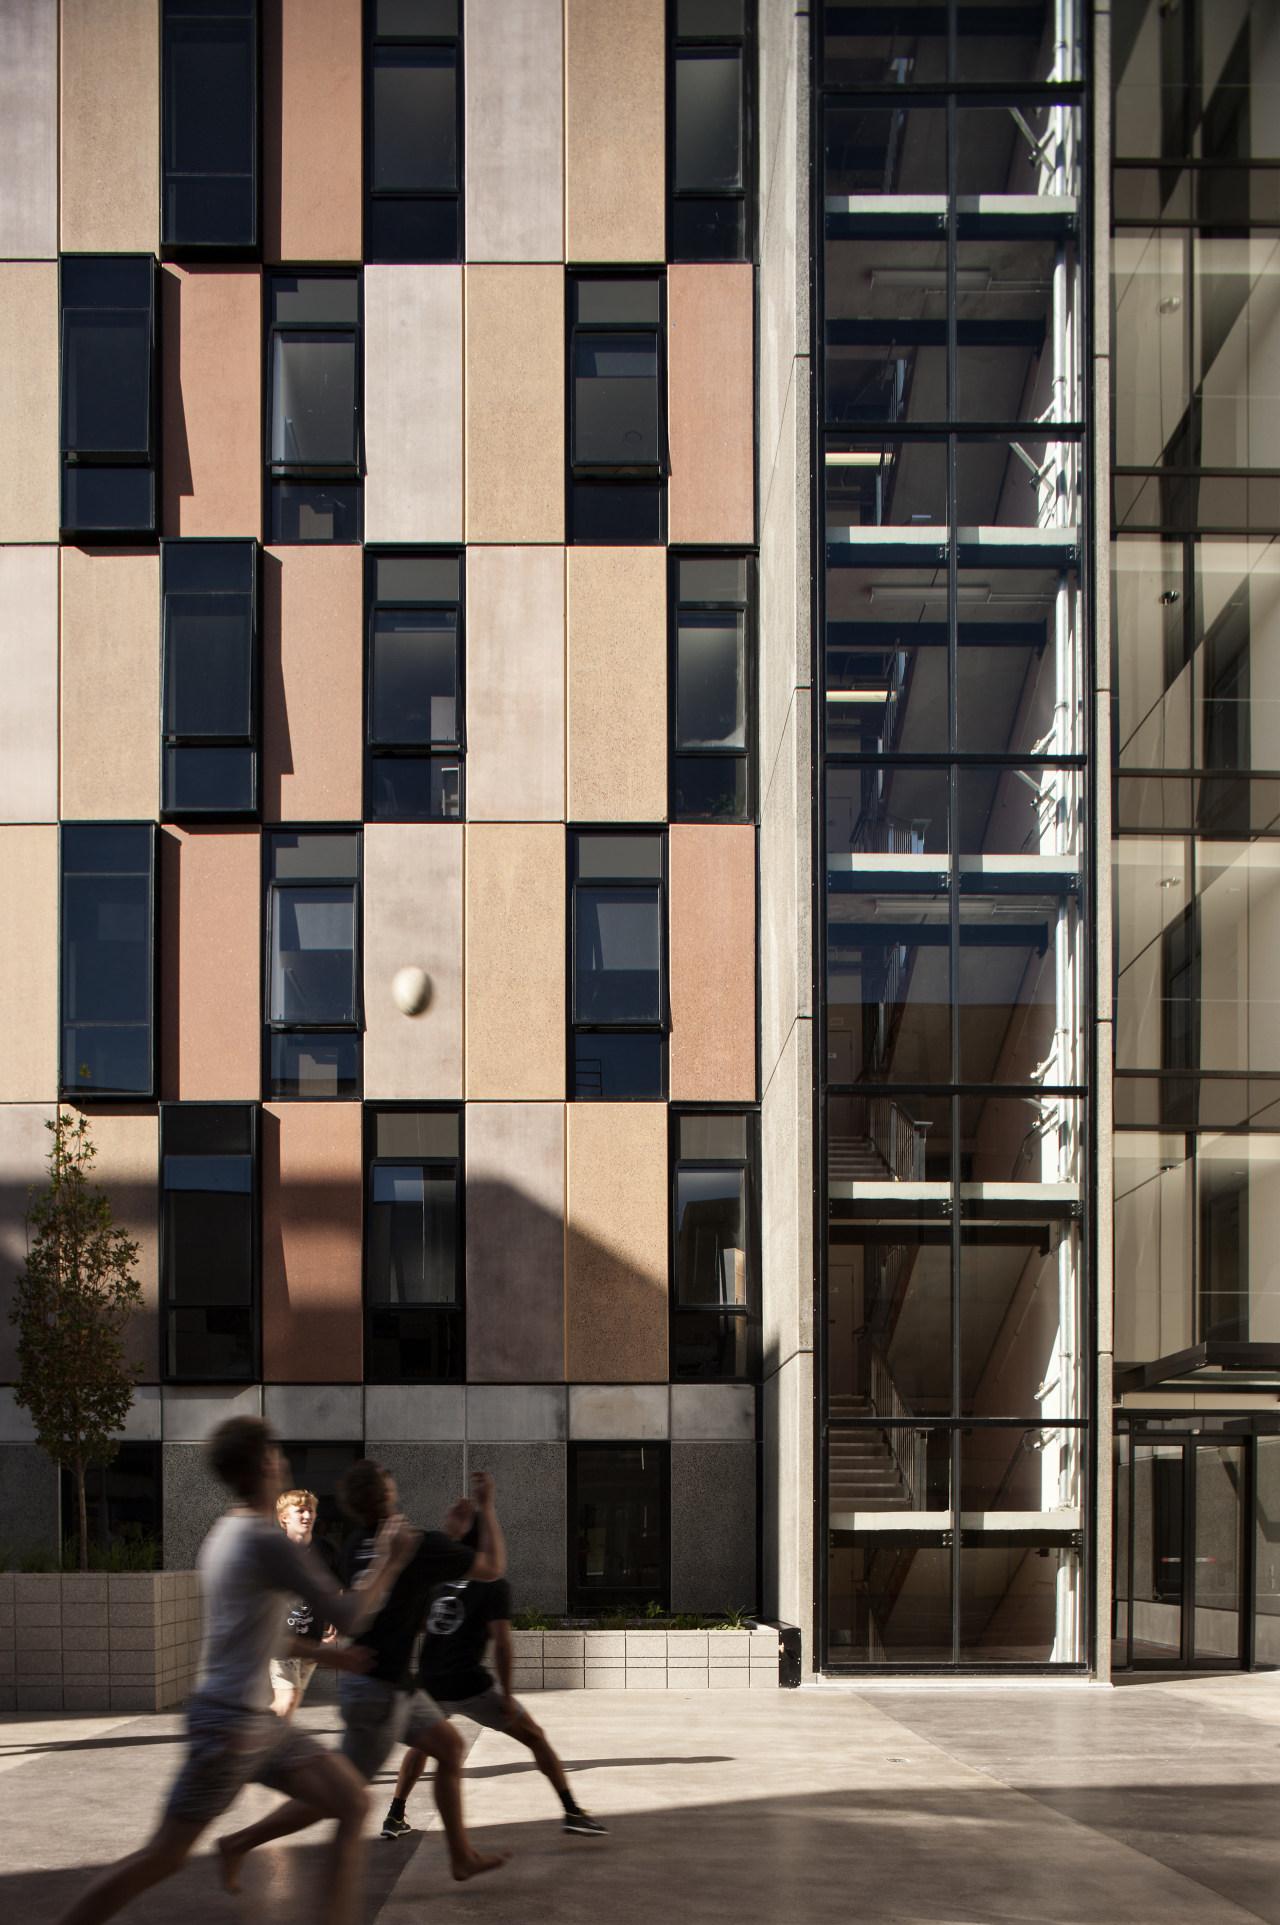 Carlaw Park Student Village in Auckland accommodates students apartment, architecture, building, condominium, facade, window, black